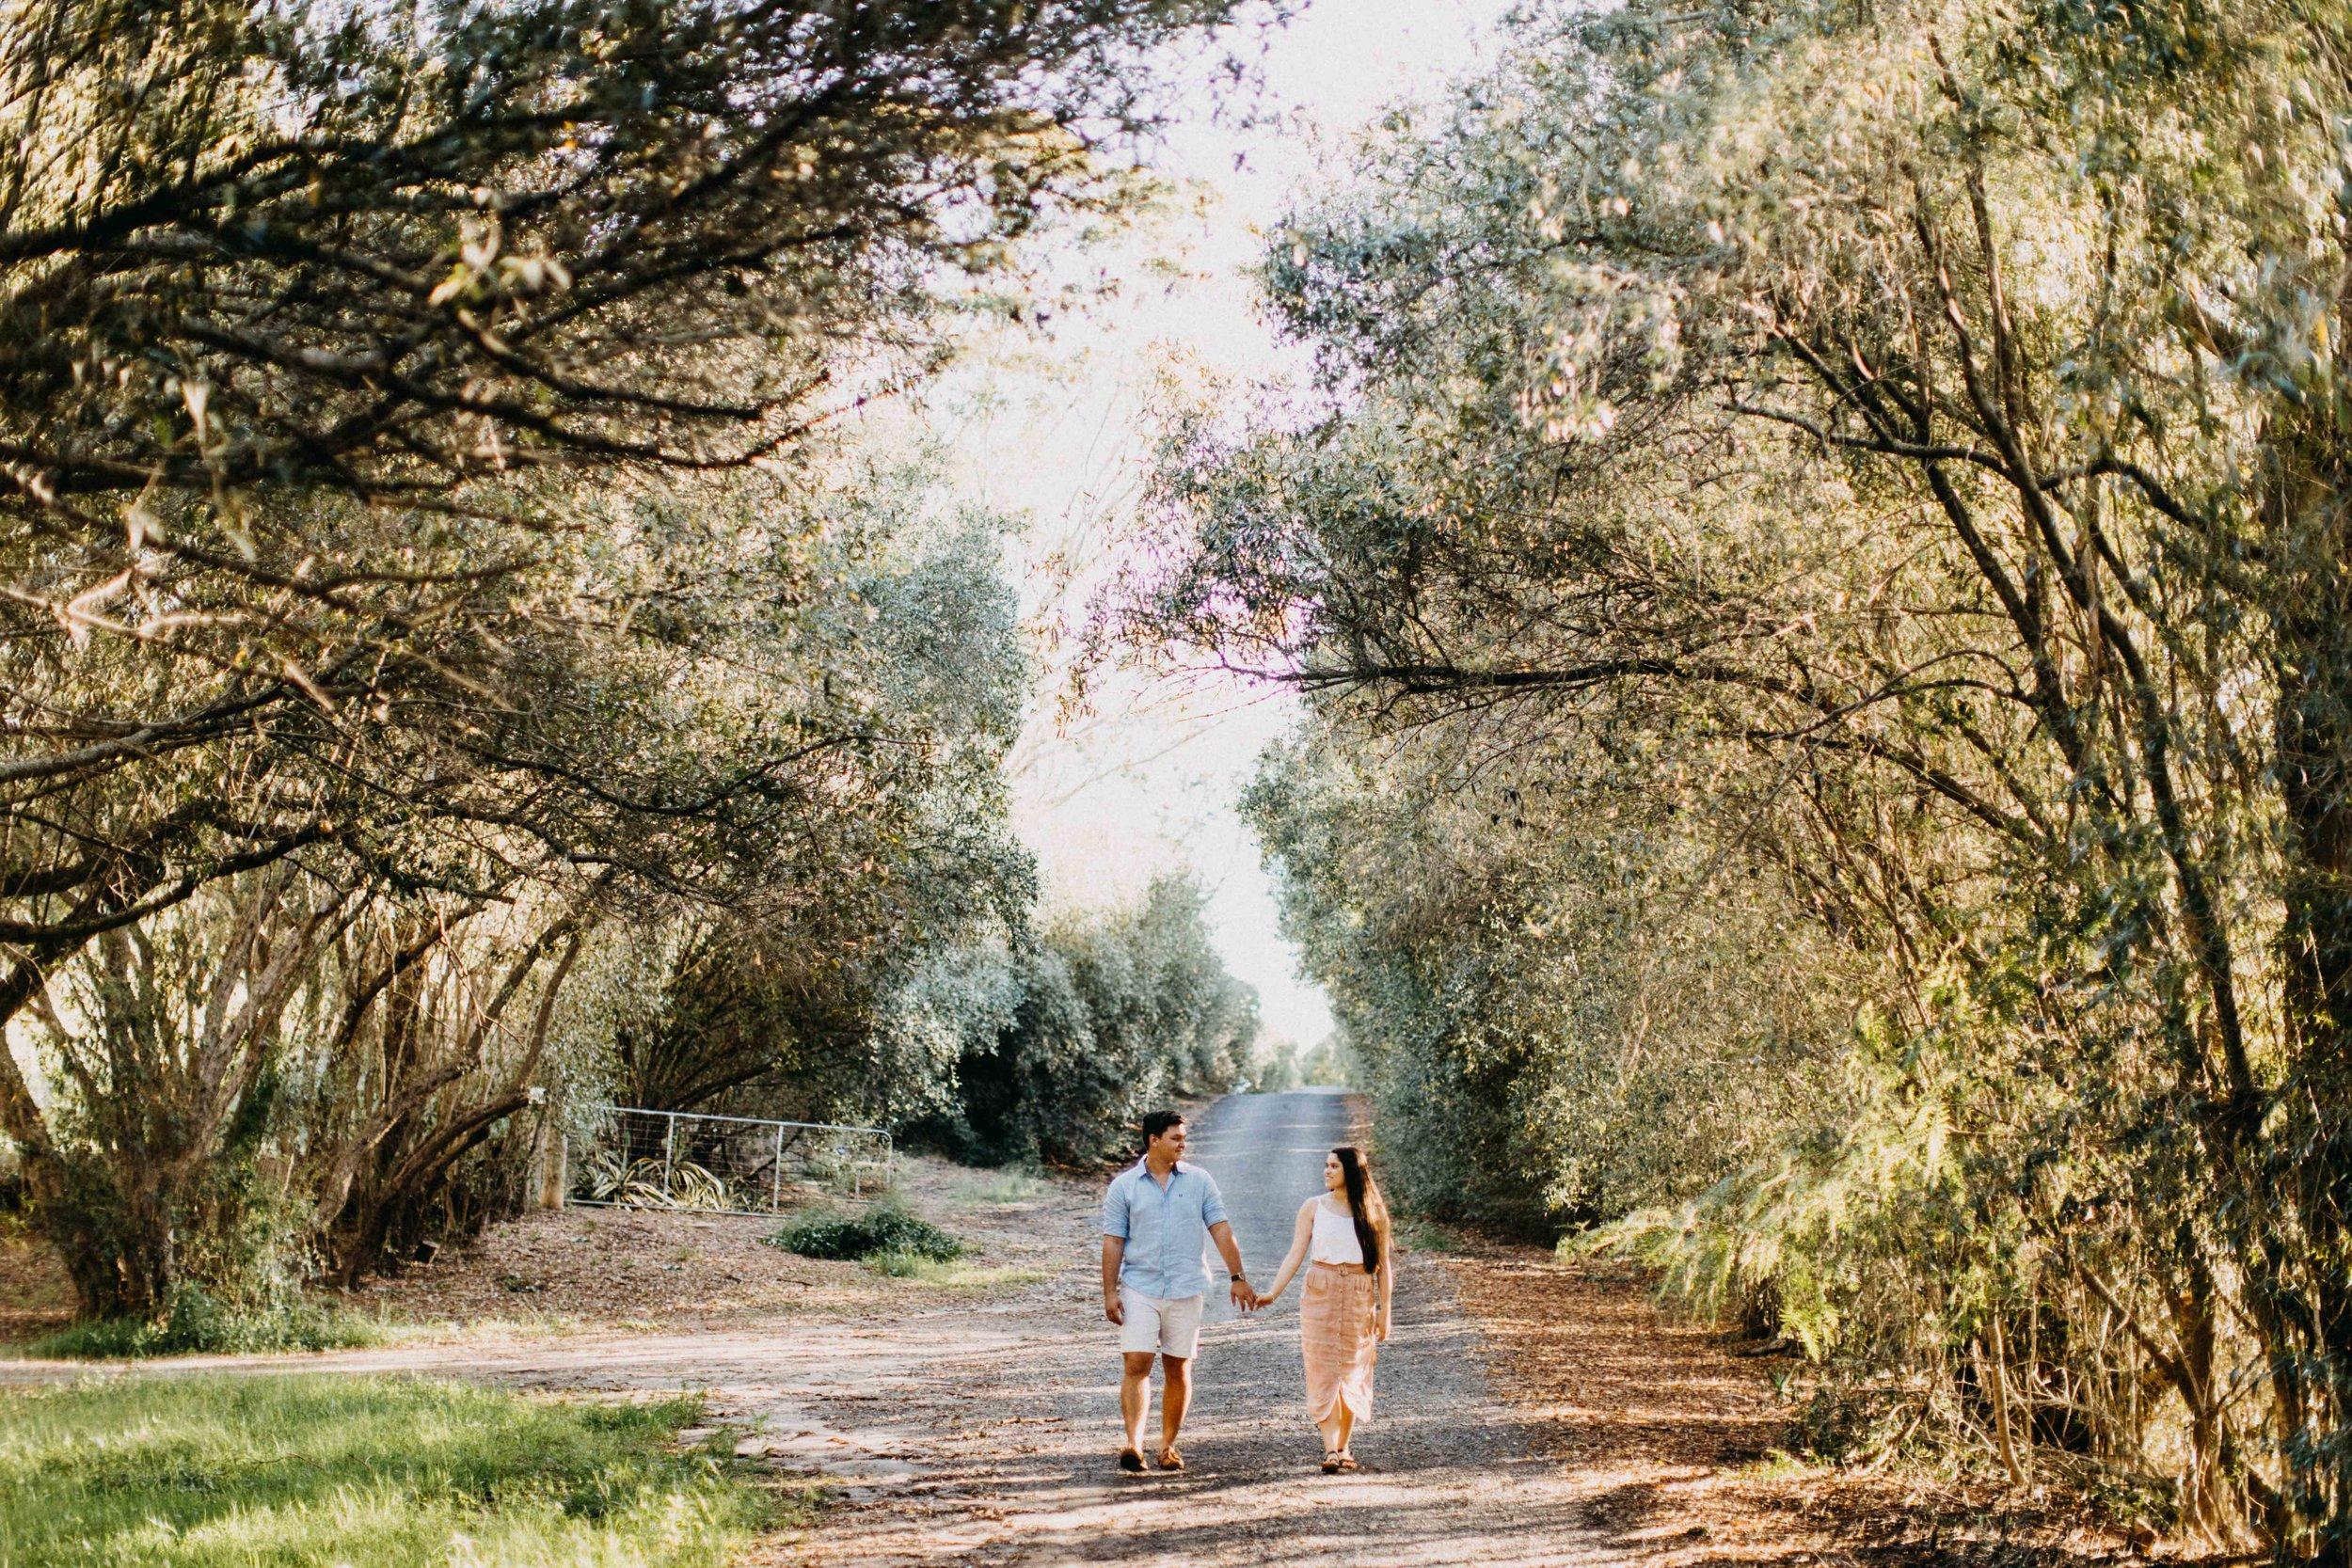 camden-engagement-photography-macarthur-www.emilyobrienphotography.net-1-2.jpg